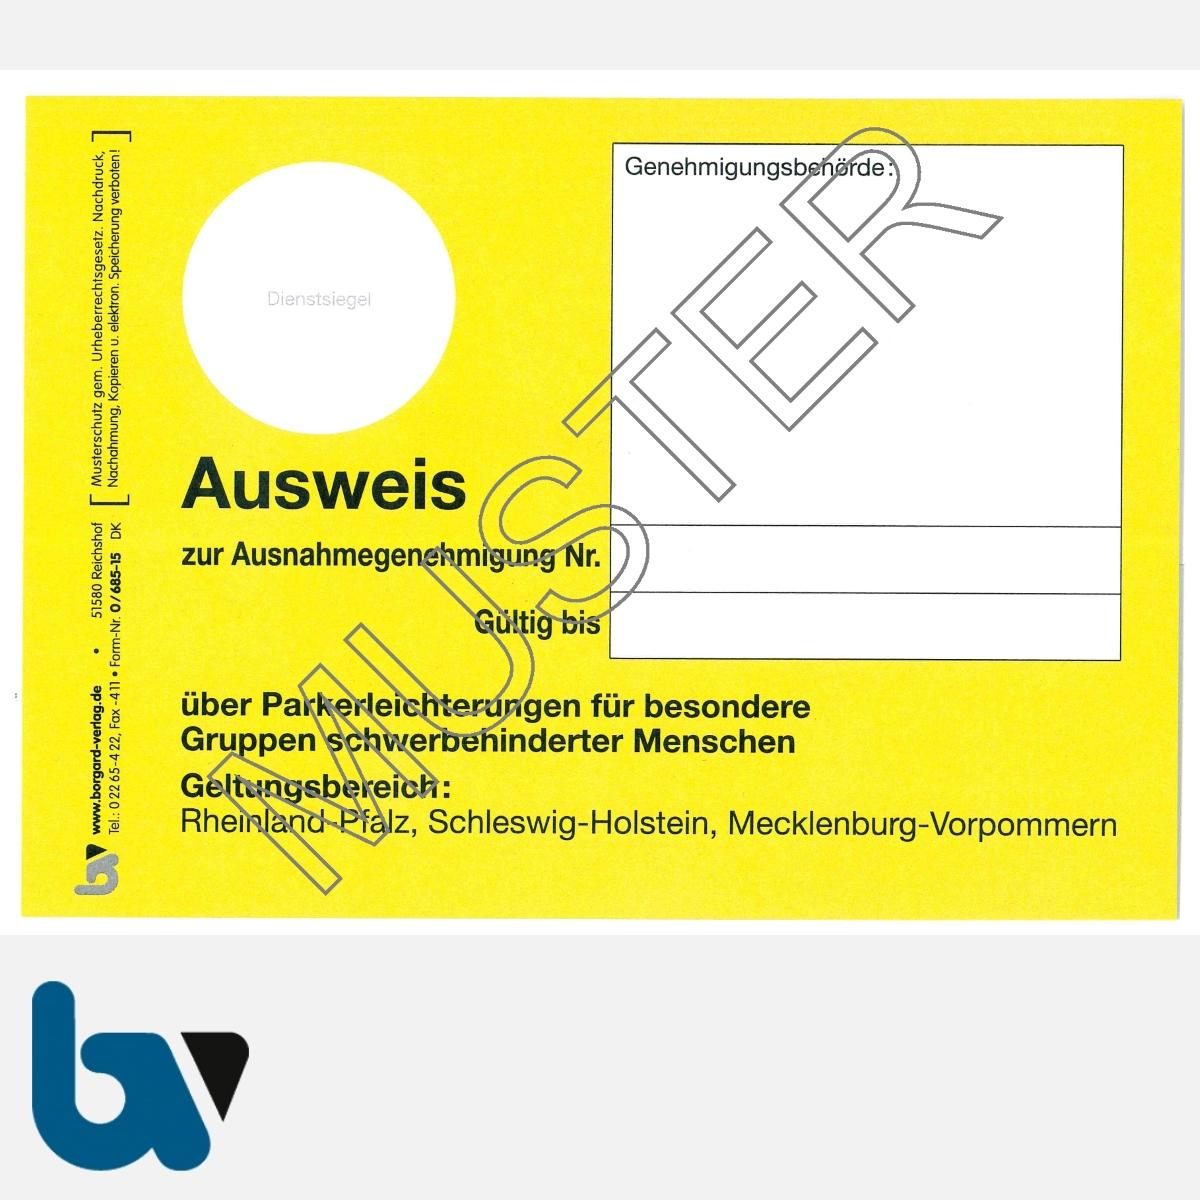 0/685-15 Parkausweis zur Ausnahmegenehmigung Parkerleichterungen Sonderregelung RP SH MV gelb Modell behinderte Menschen DIN A6 VS | Borgard Verlag GmbH